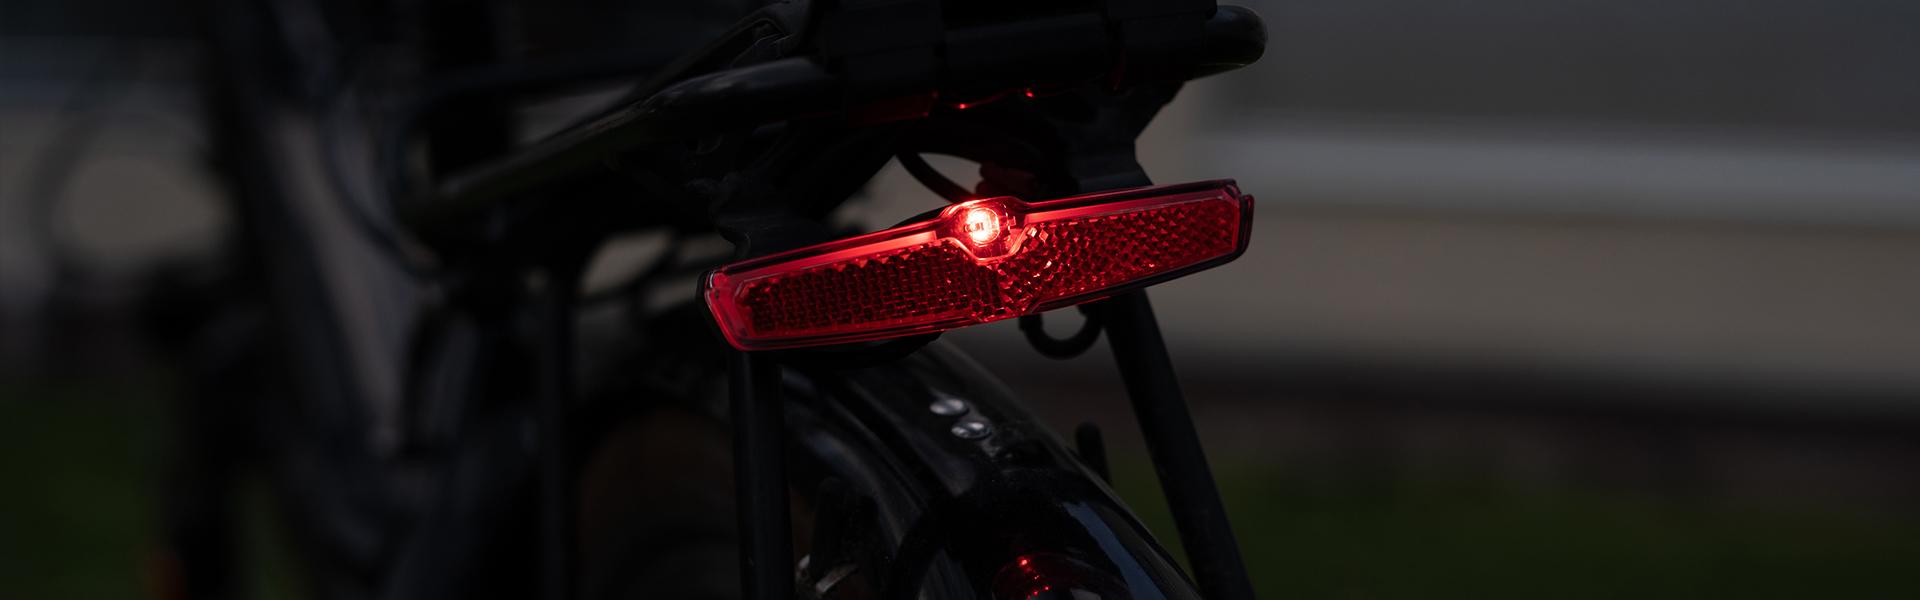 Sate-lite CREE 70lux ebike light StVZO  eletric bike headlight front fork 12-48V